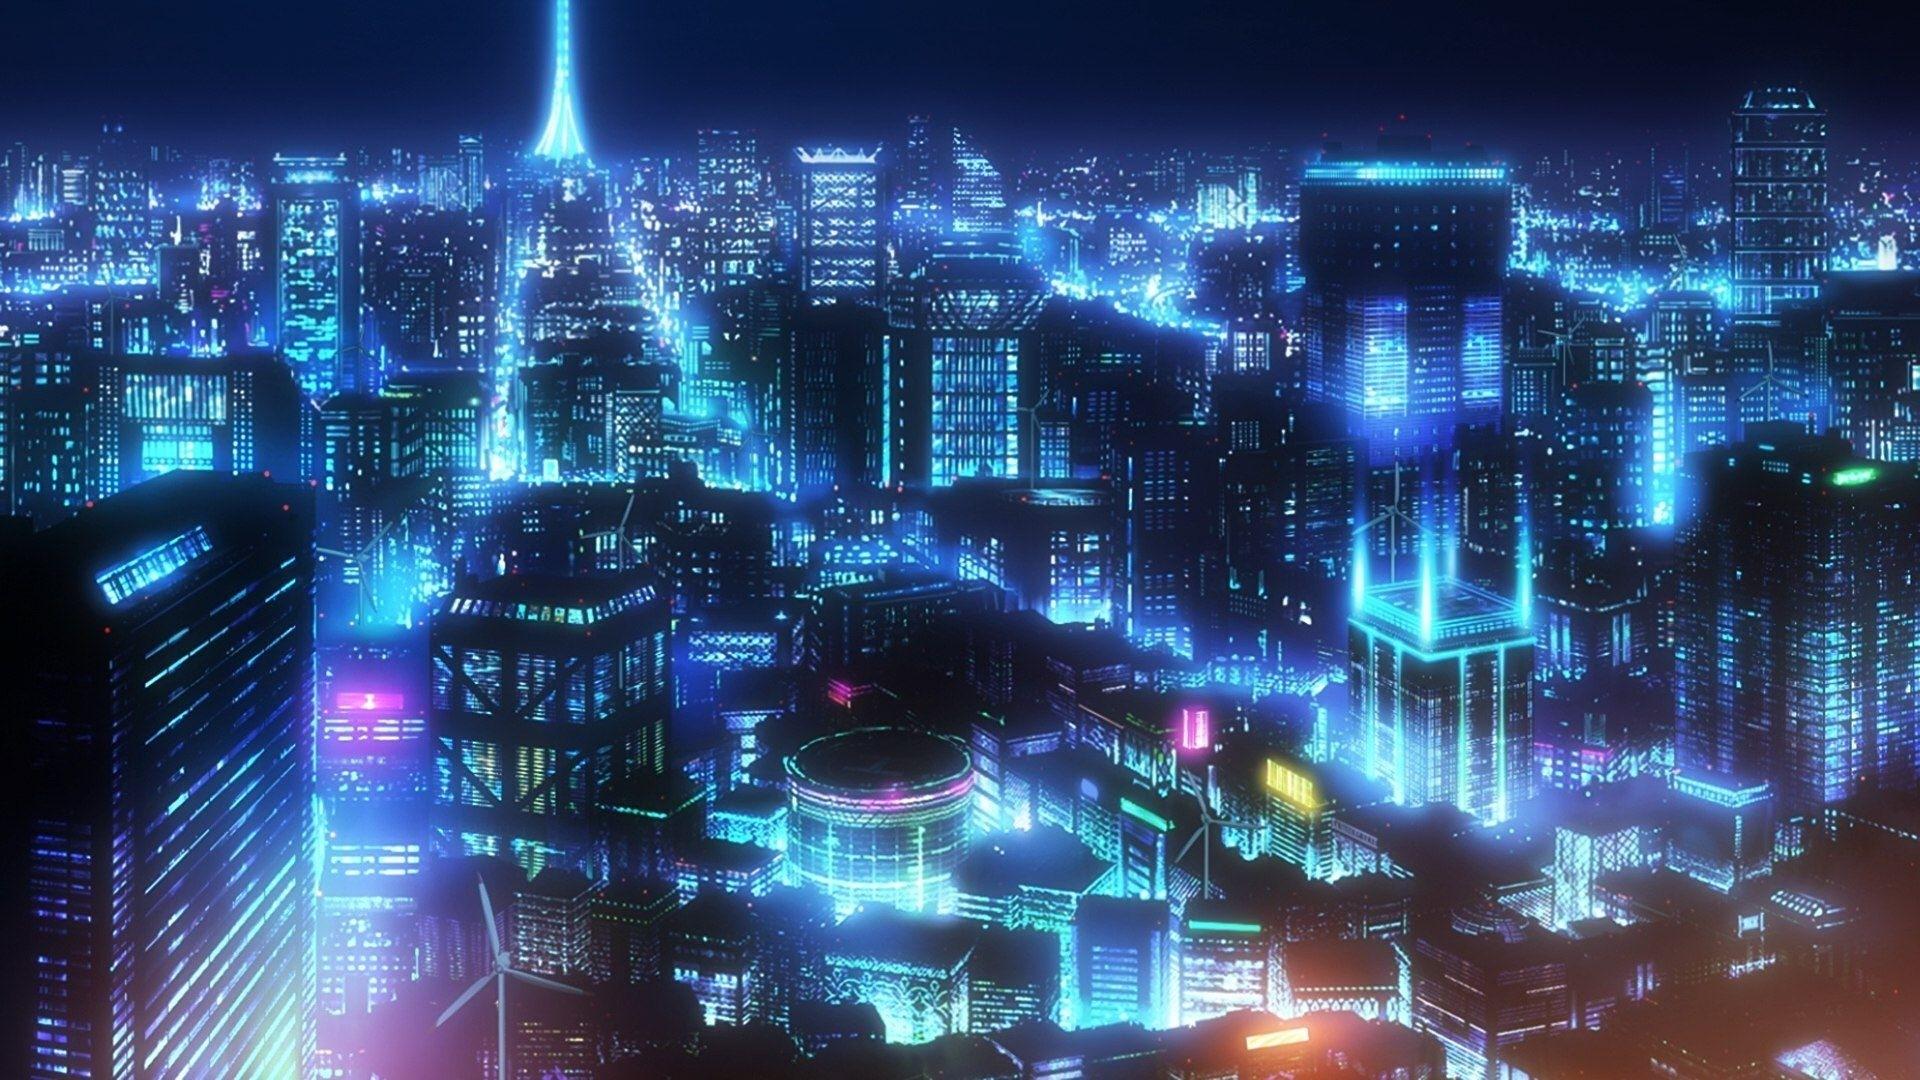 Anime Night Neon wallpaper for computer